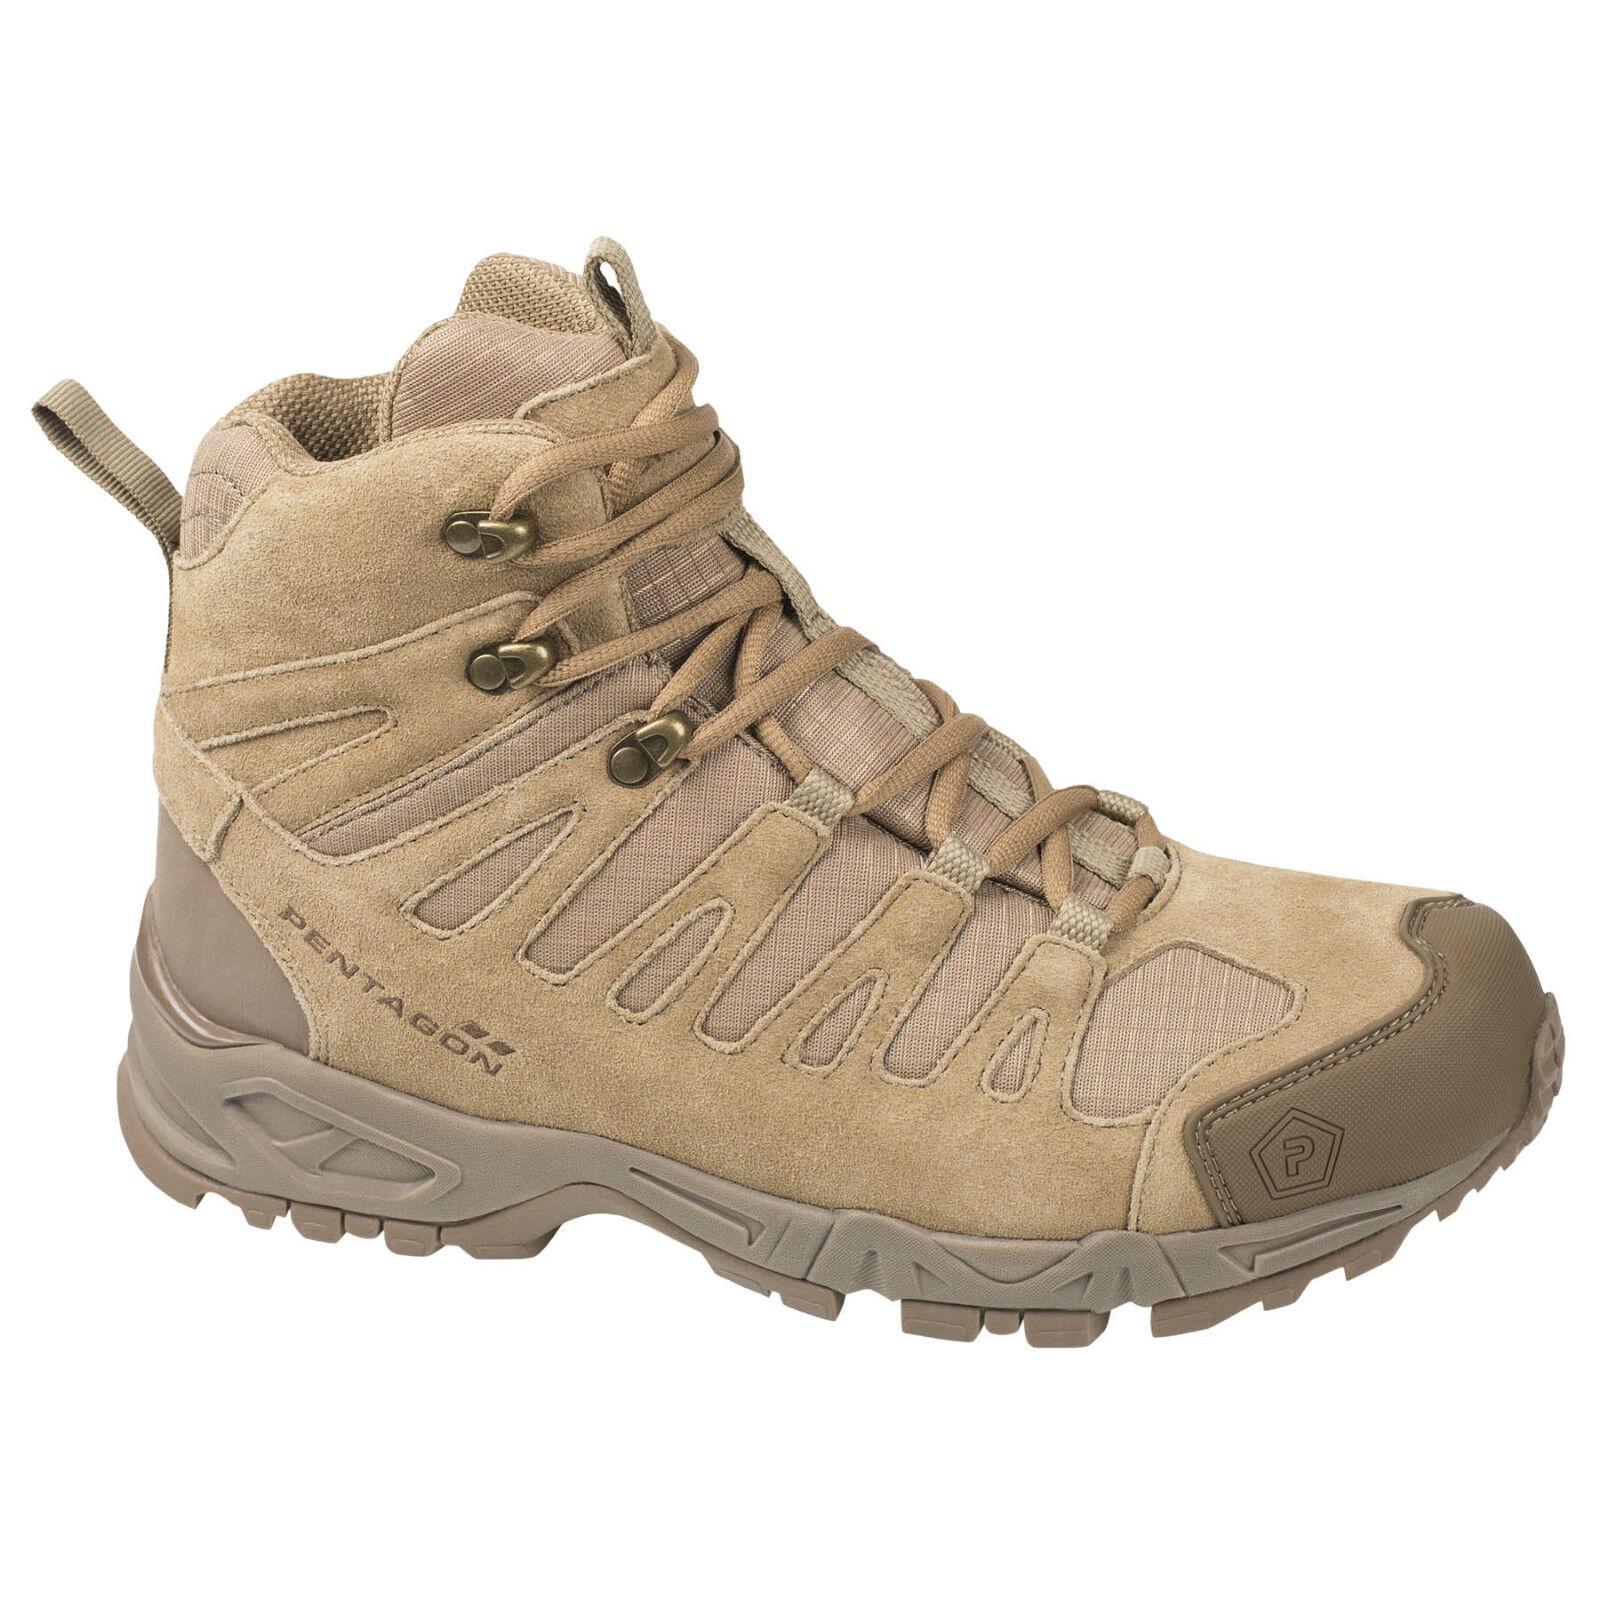 Pentagon Militärschuhe Stiefel Stiefel Mann Frau Militär Achilles Trek n 36